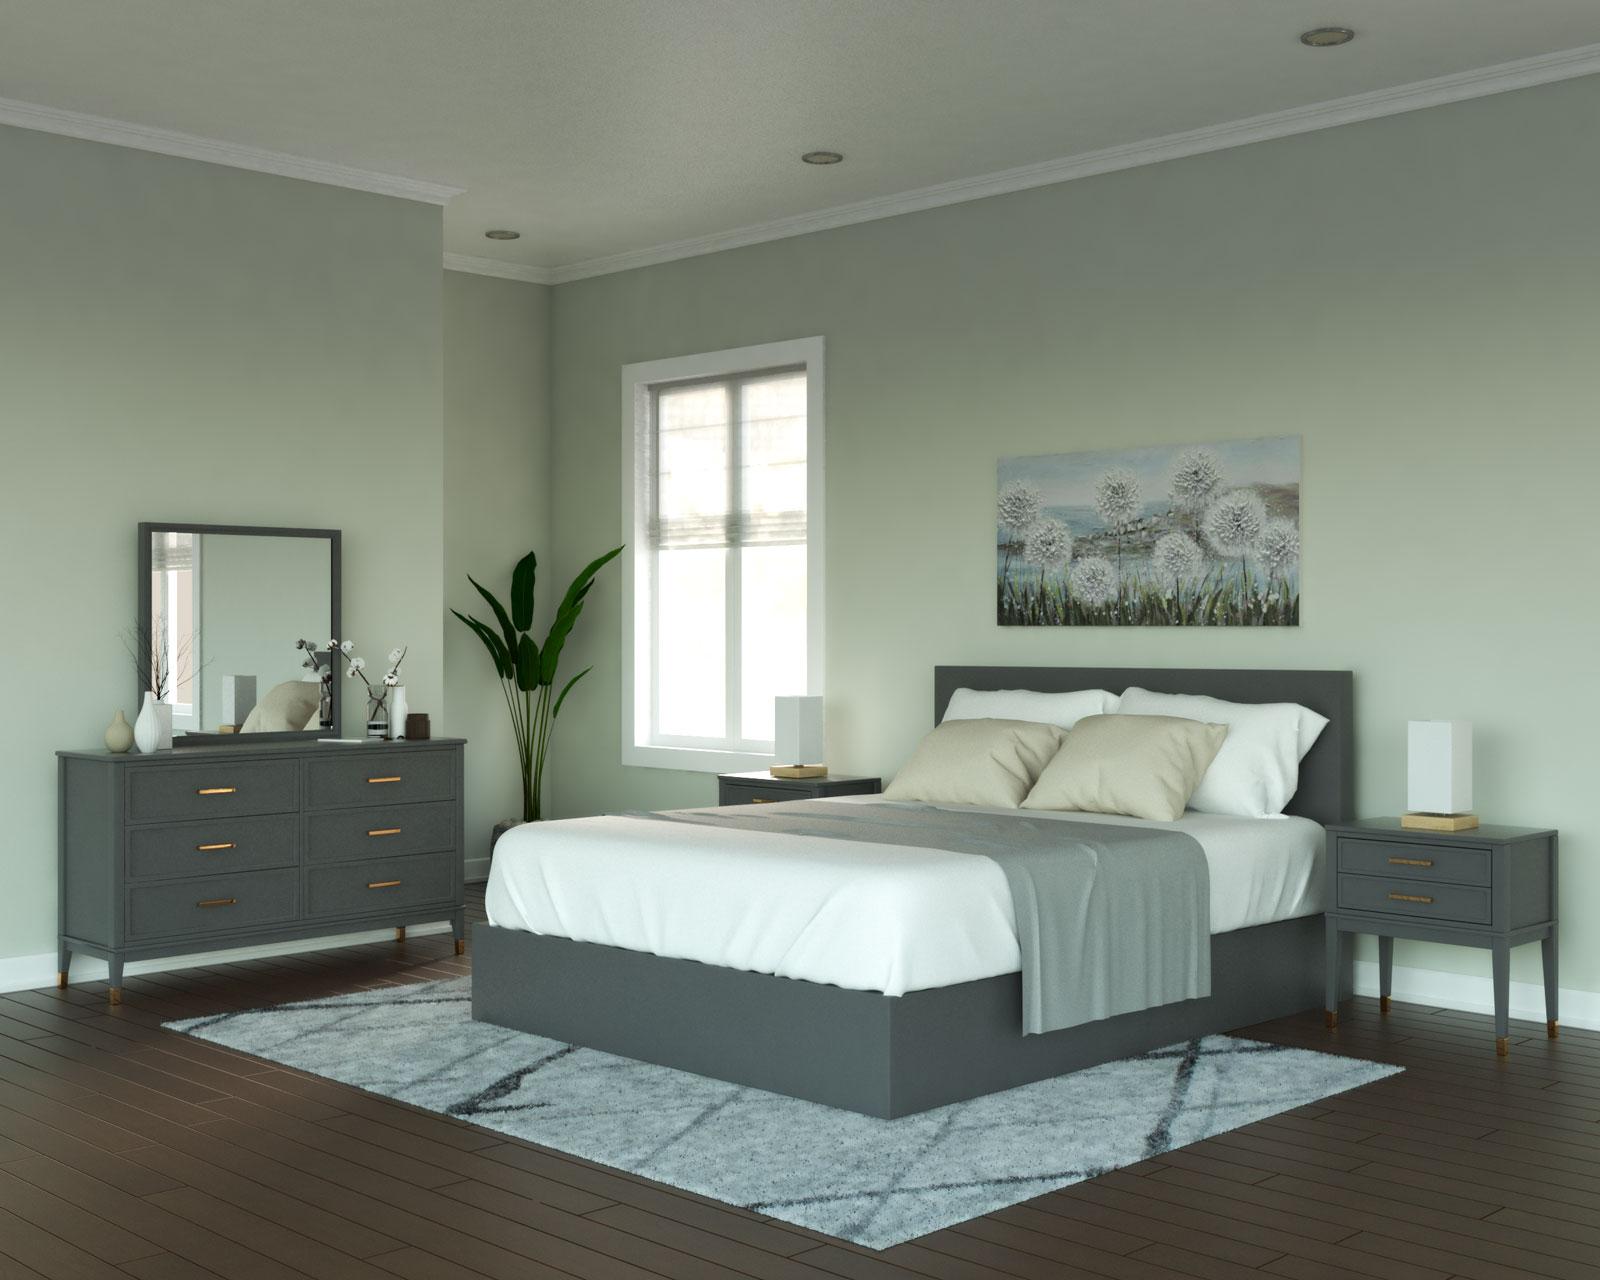 Pearl gray walls with gray furnishings